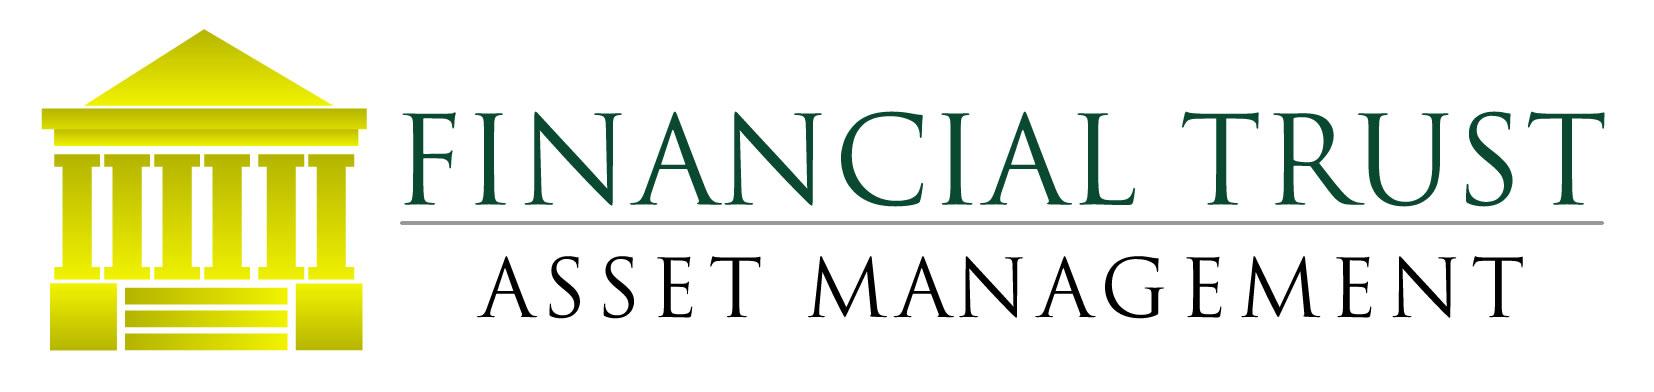 Financial Trust Logo.jpg